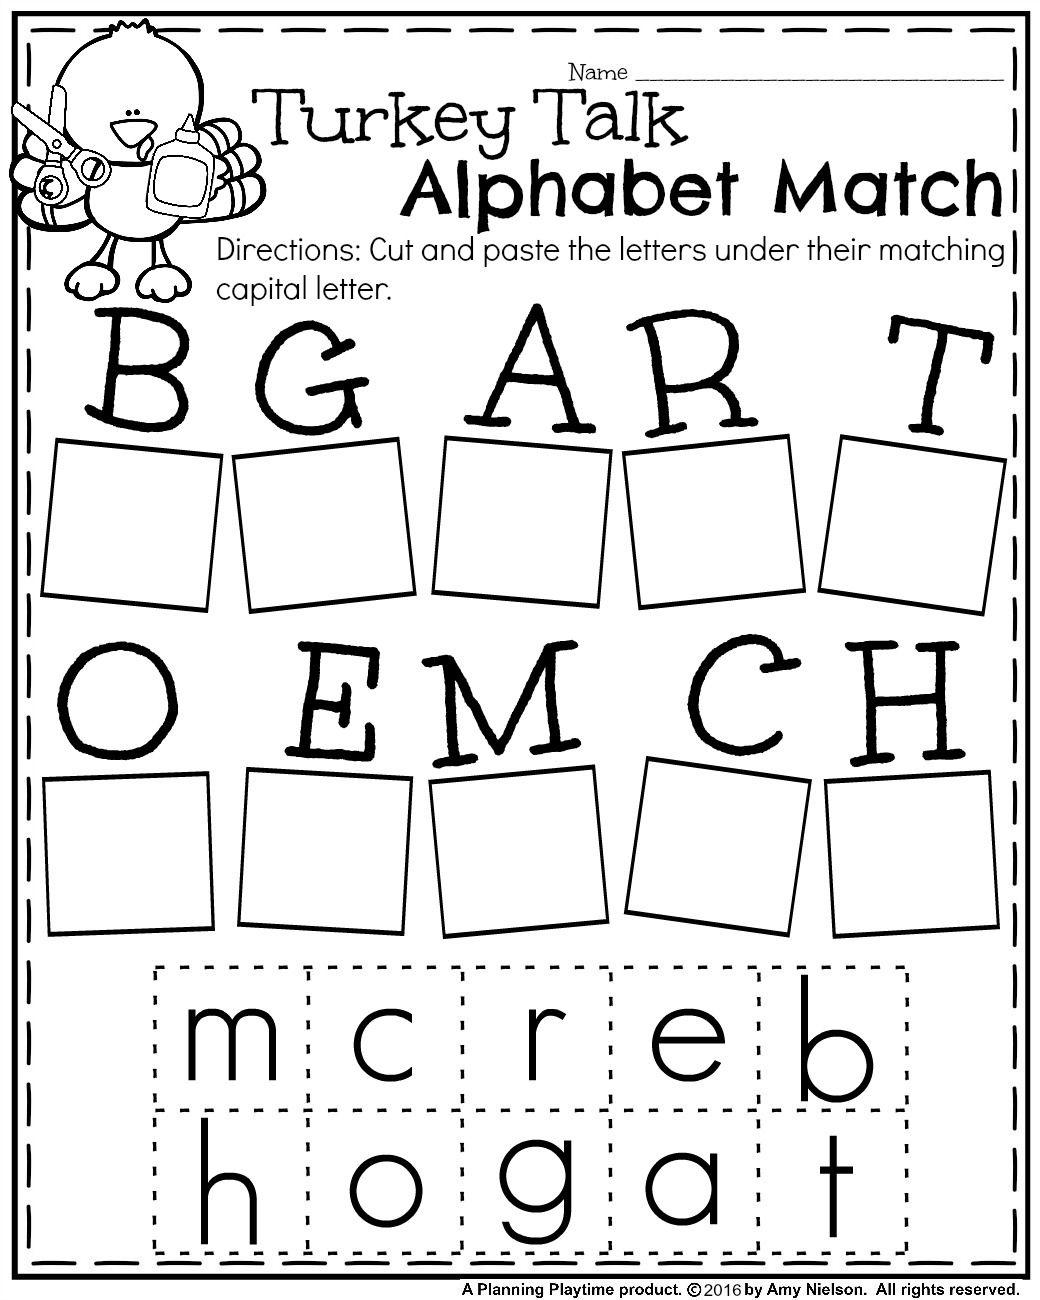 Fall Kindergarten Worksheets For November | Kindergarten intended for Letter Matching Worksheets Cut And Paste